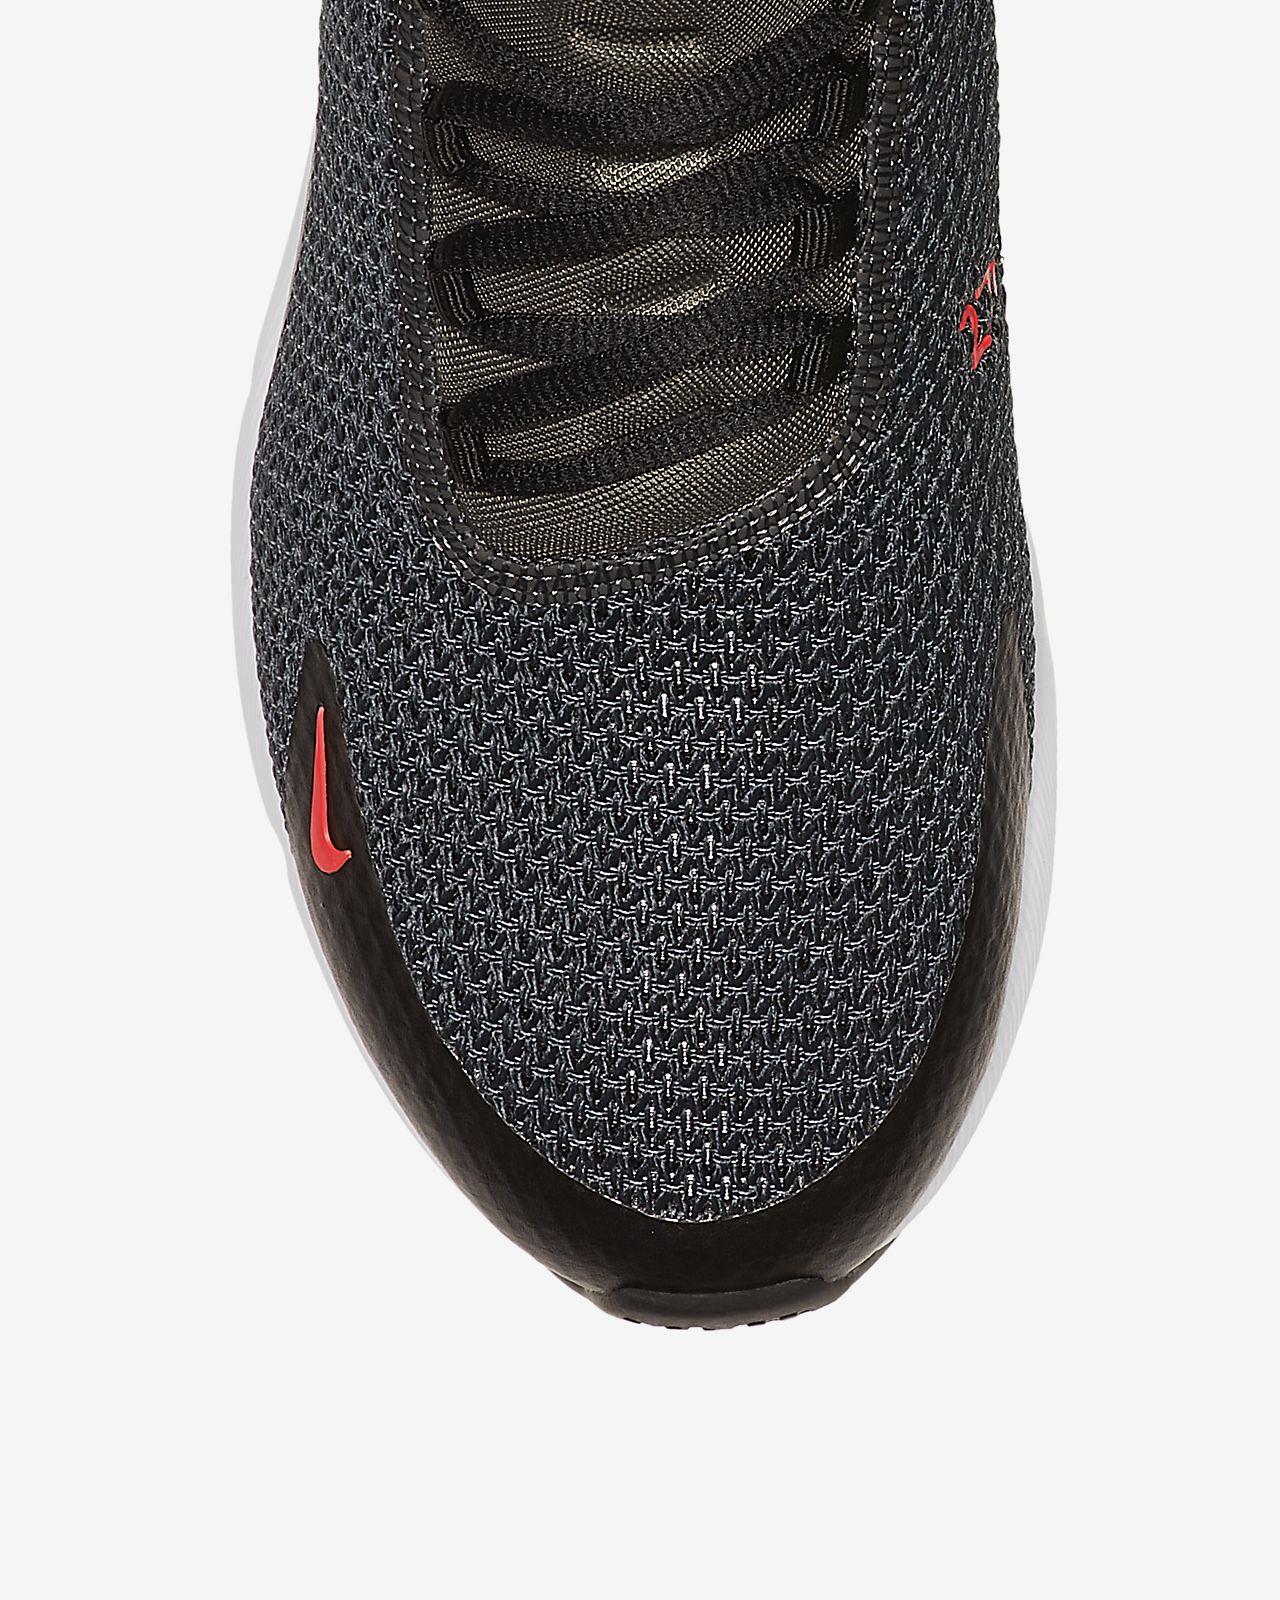 Nike AIR MAX 270 SE TURNSCHUHE SPORTSCHUHE LAUFSCHUHE AQ9164